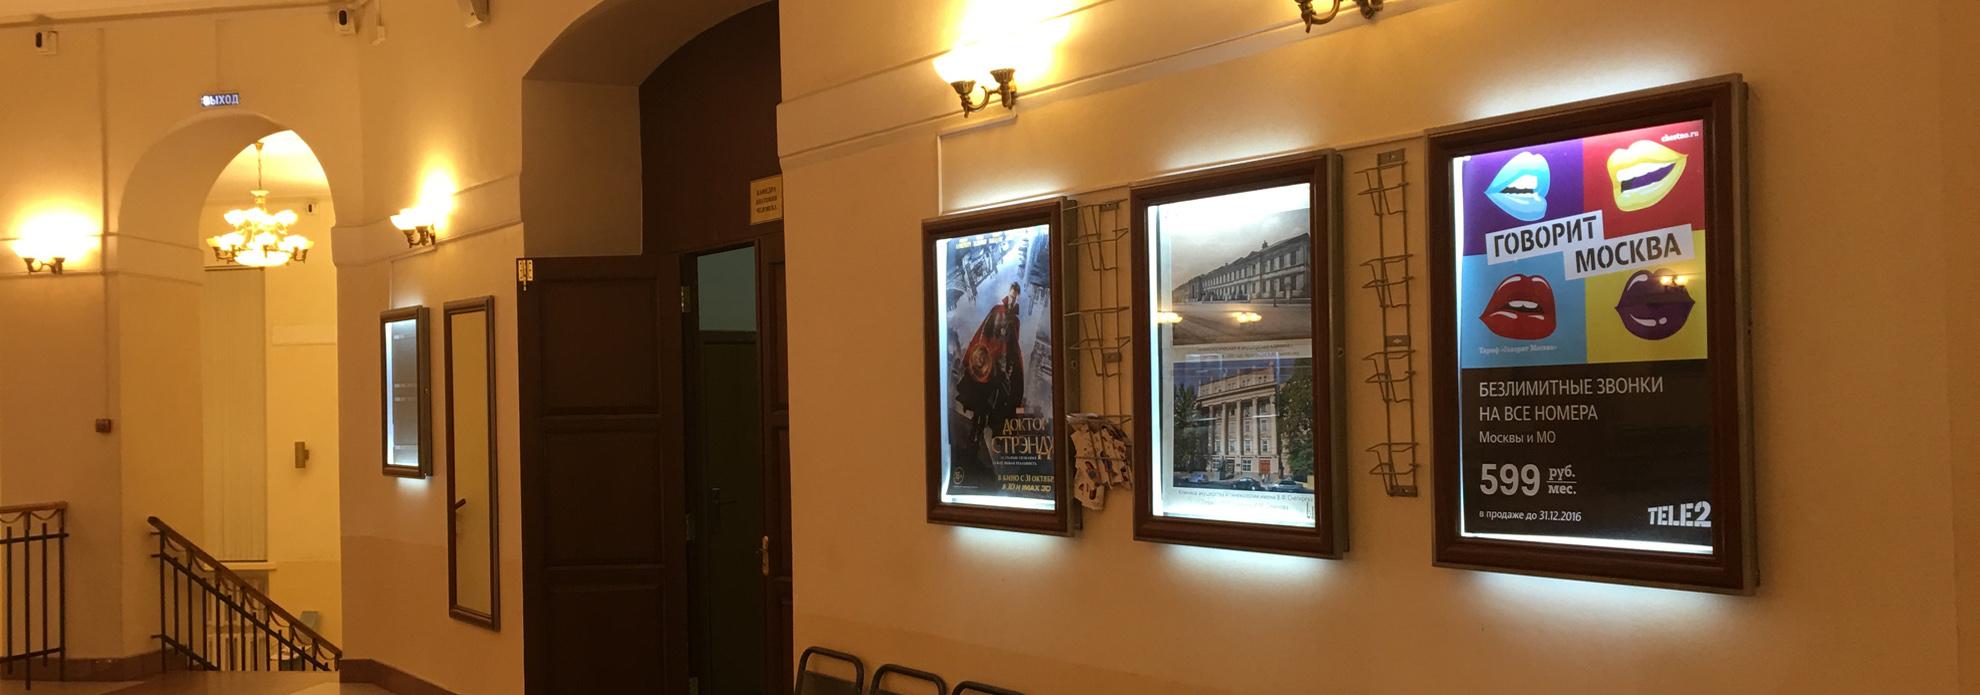 indoor-reklama-institute-moskva-mgmu-sechenova-mohovaya